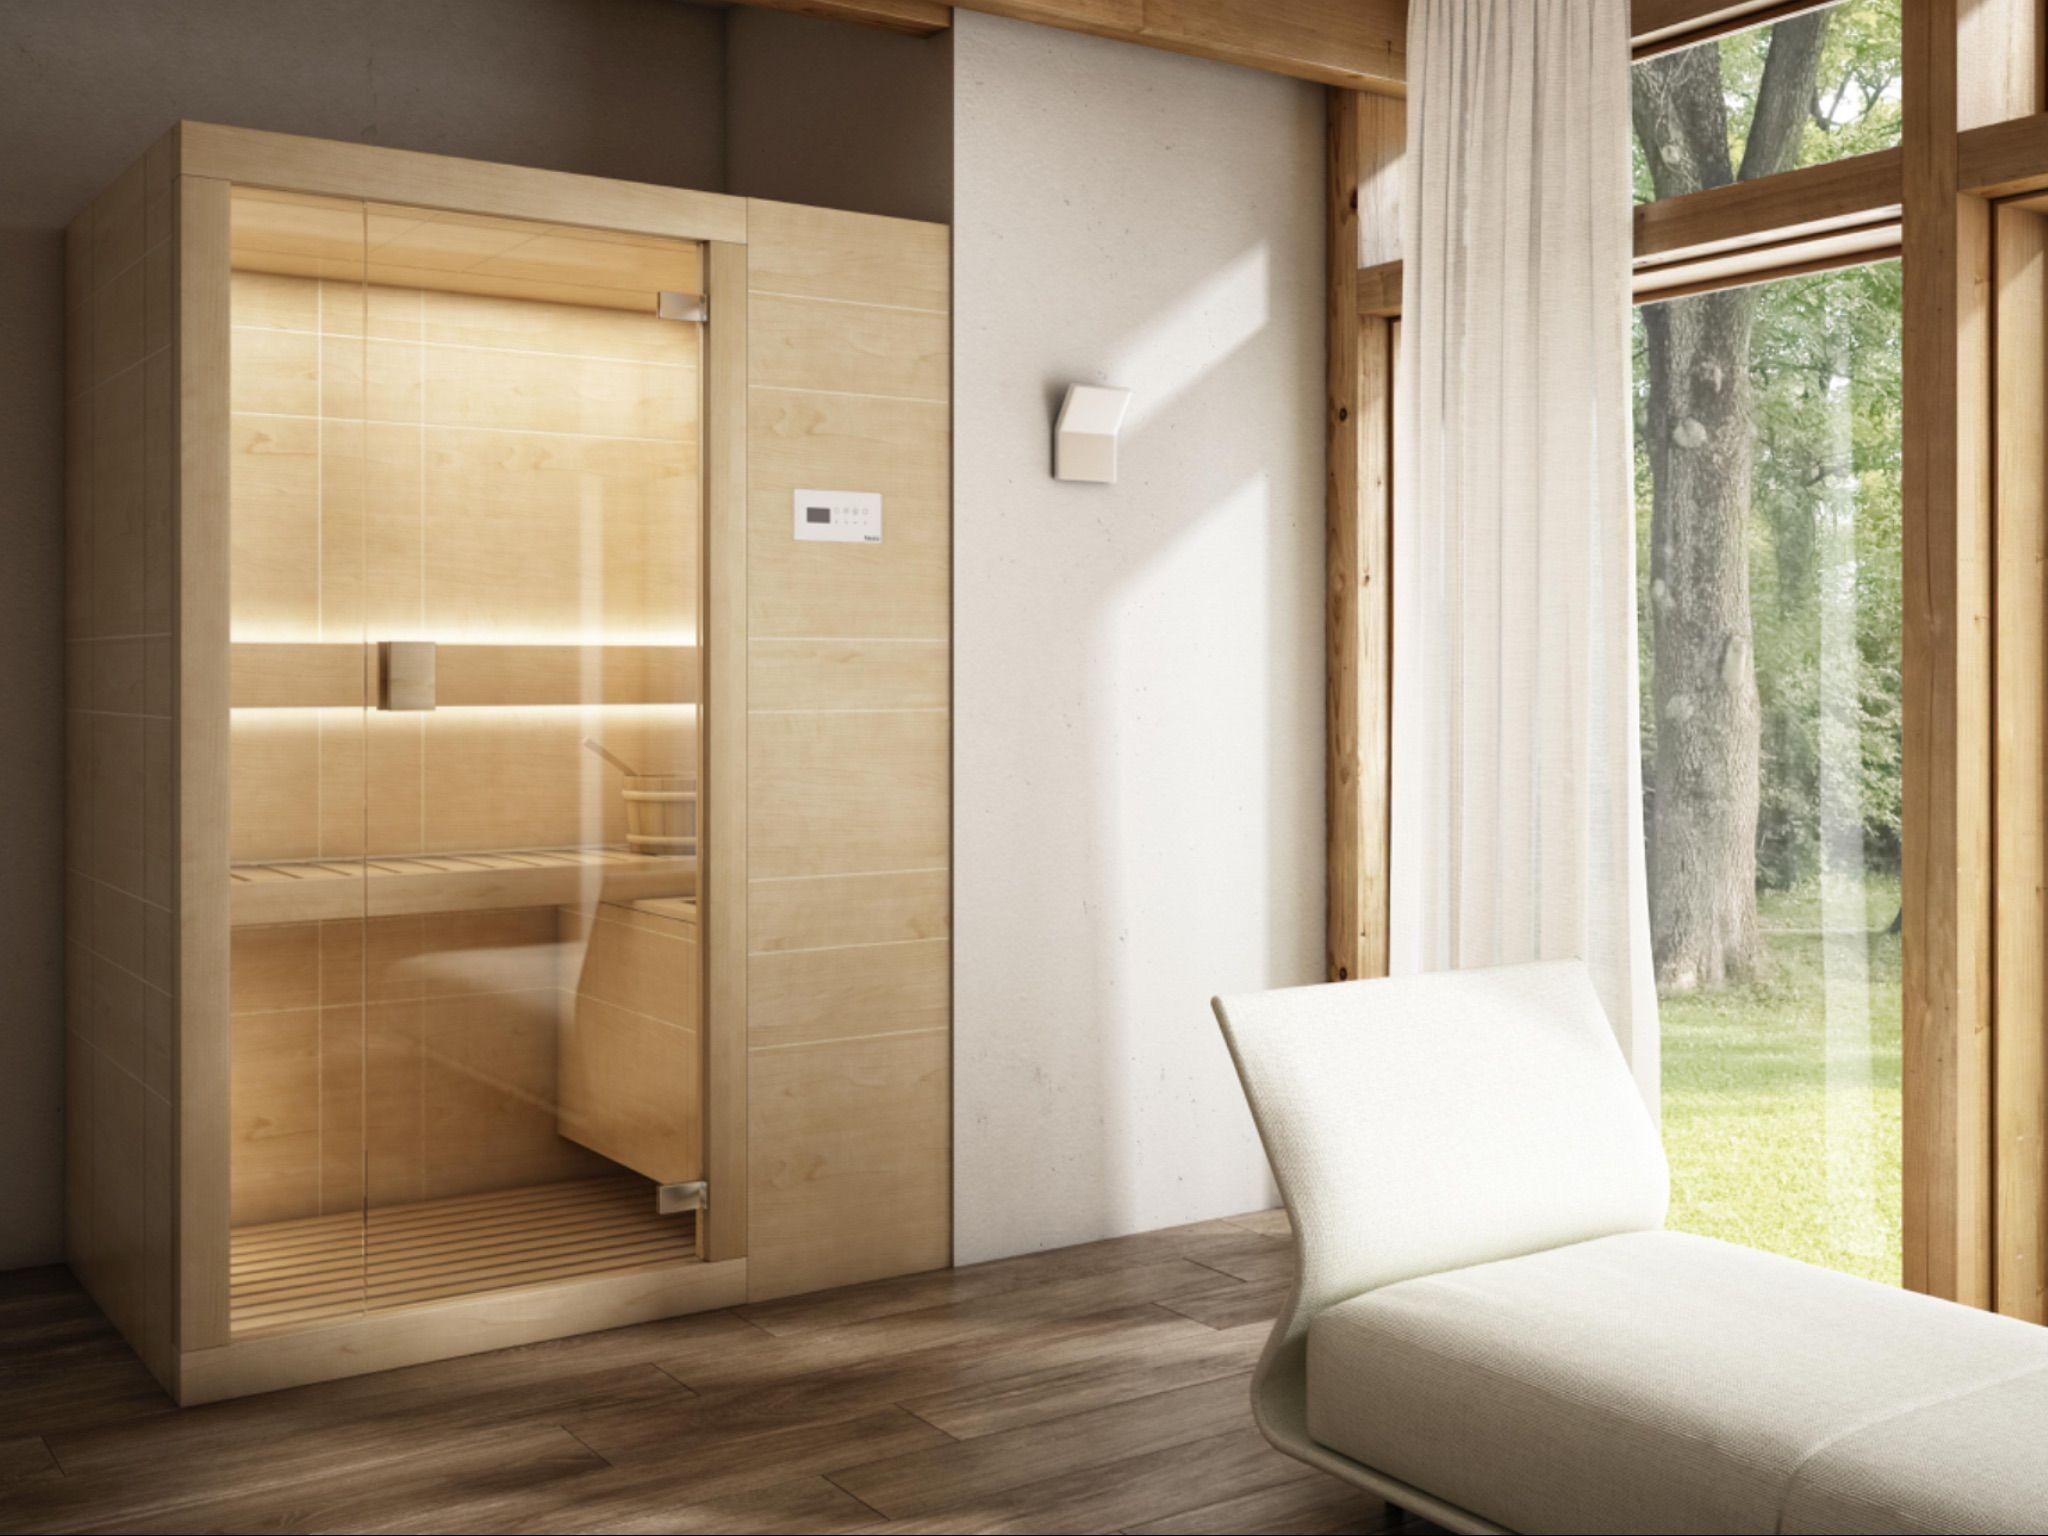 Perfect E Progetto.com Teuco Arja Finnish Saunas/Arja 150X100 CM /180X120 Amazing Design